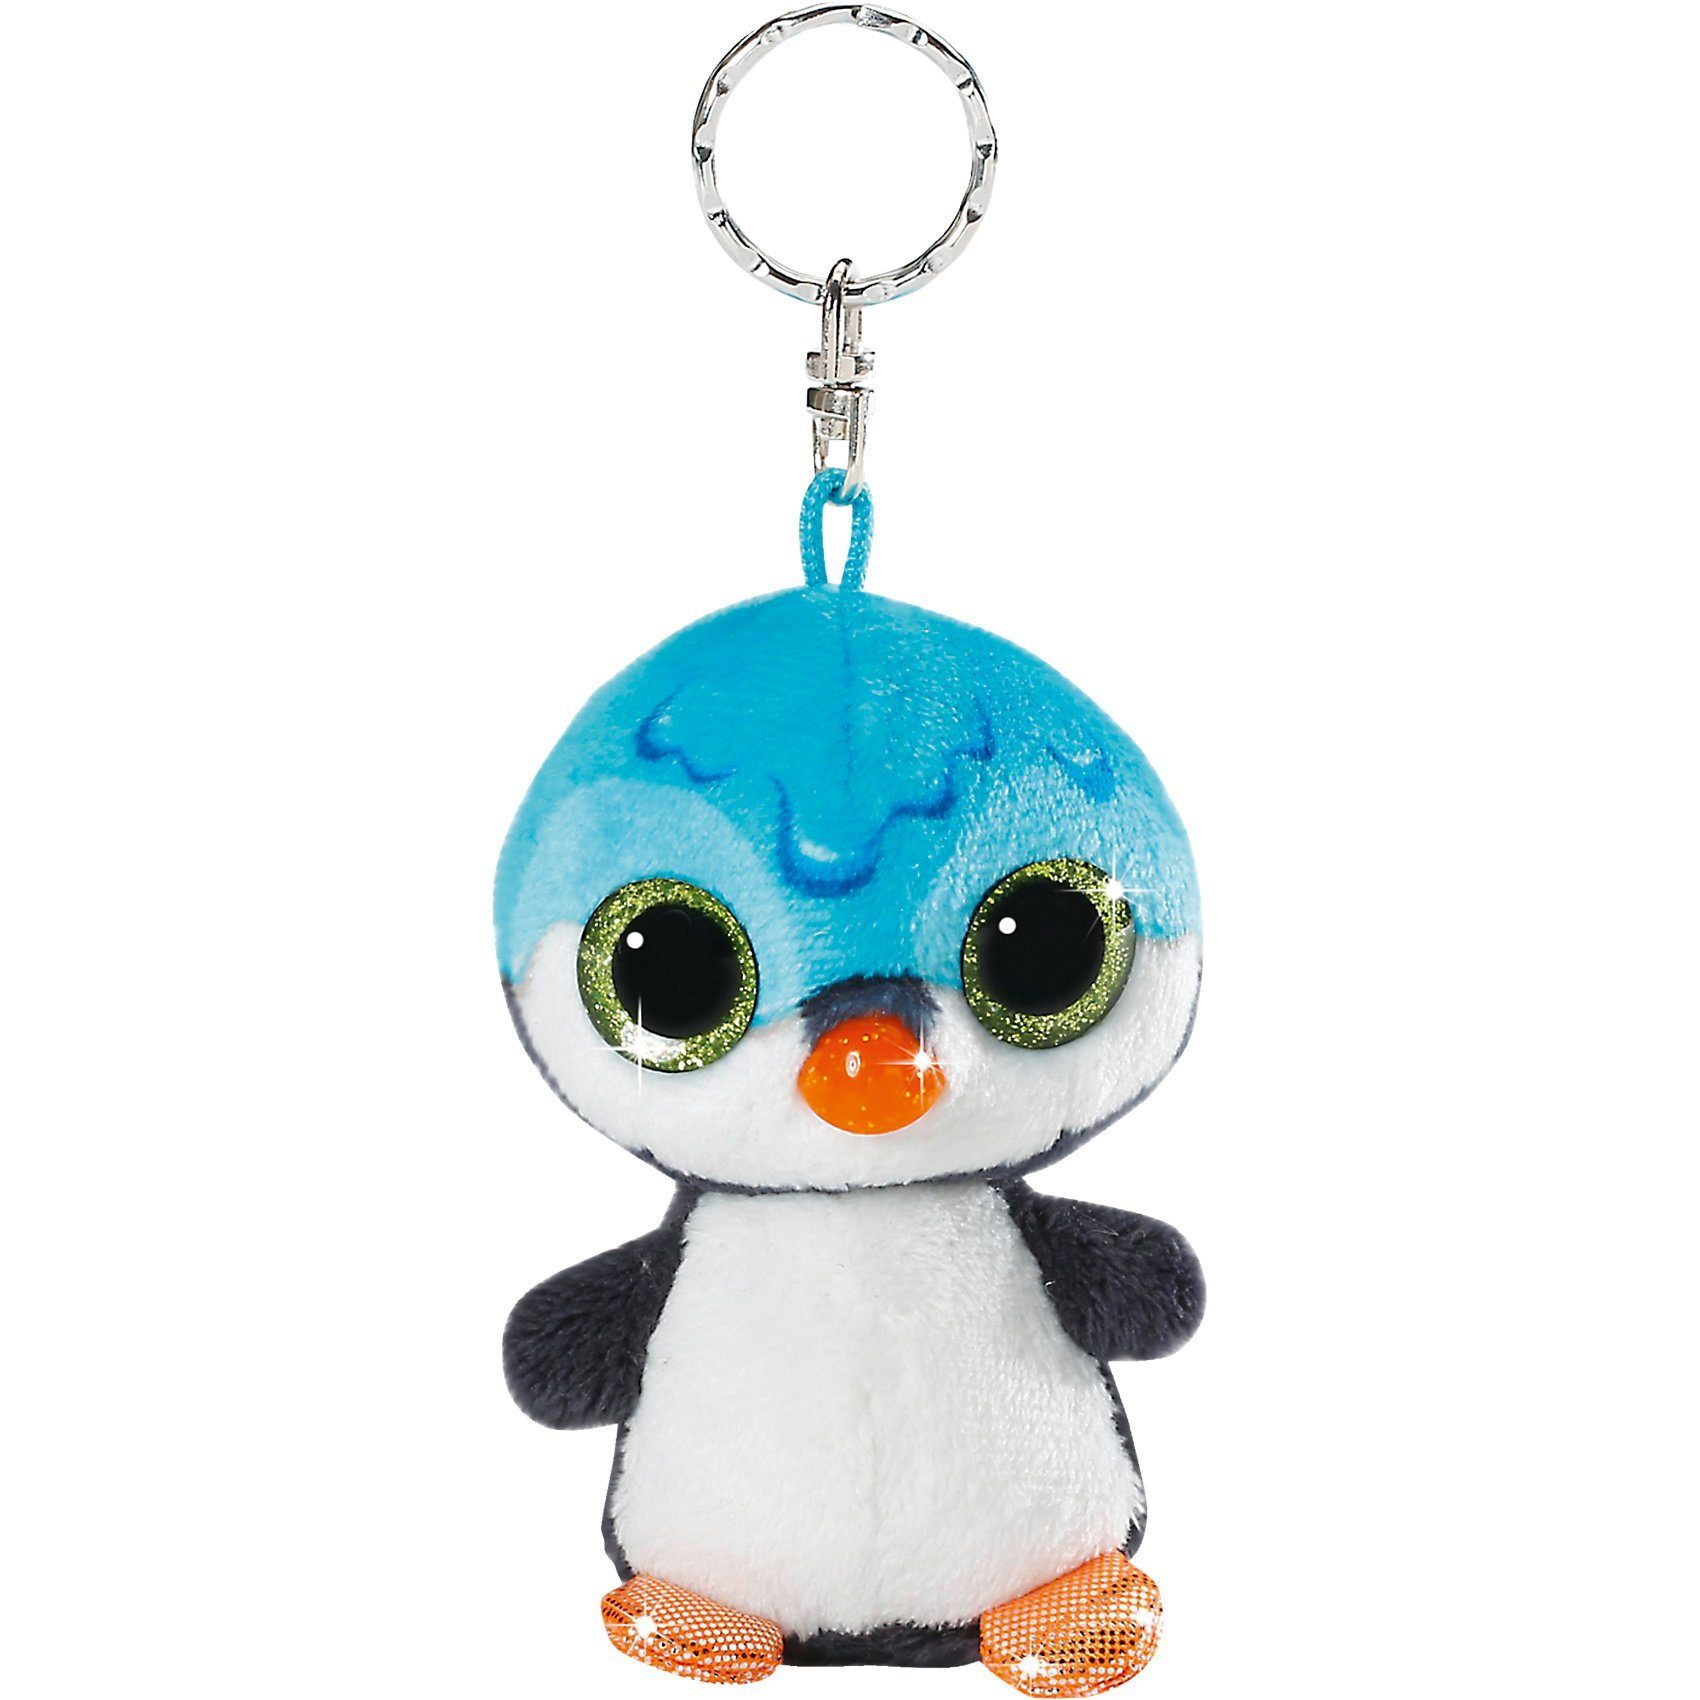 NICI doos Sirup Pinguin Pripp classic Bean Bag Schlüsselanhänger